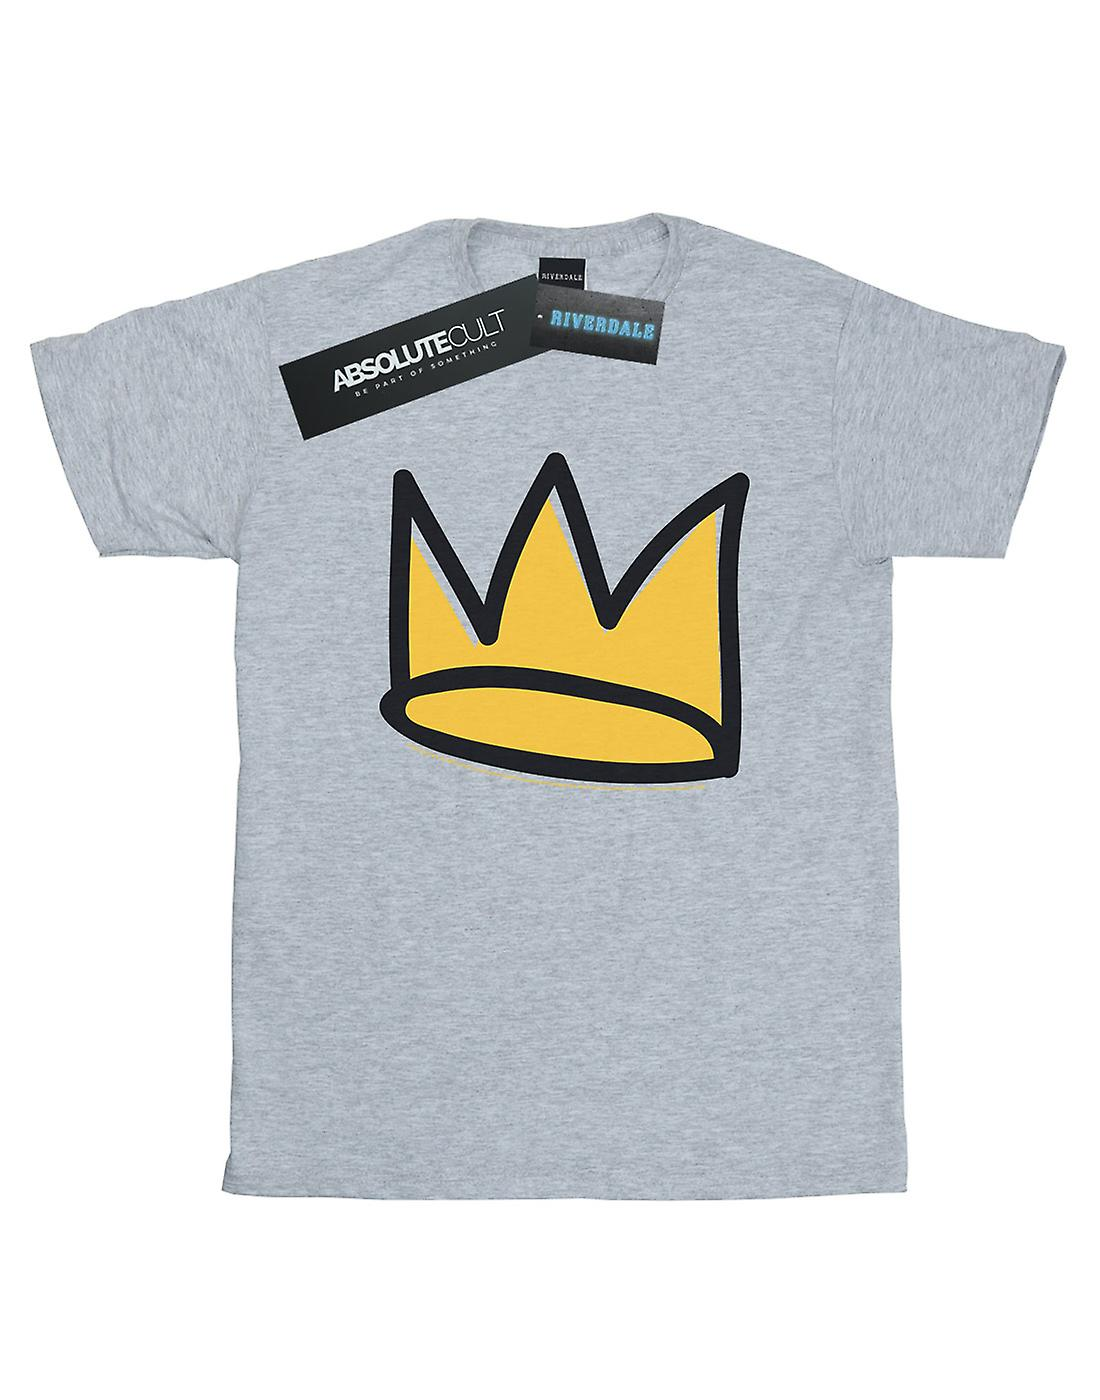 Riverdale Men's Jughead Hat T-Shirt